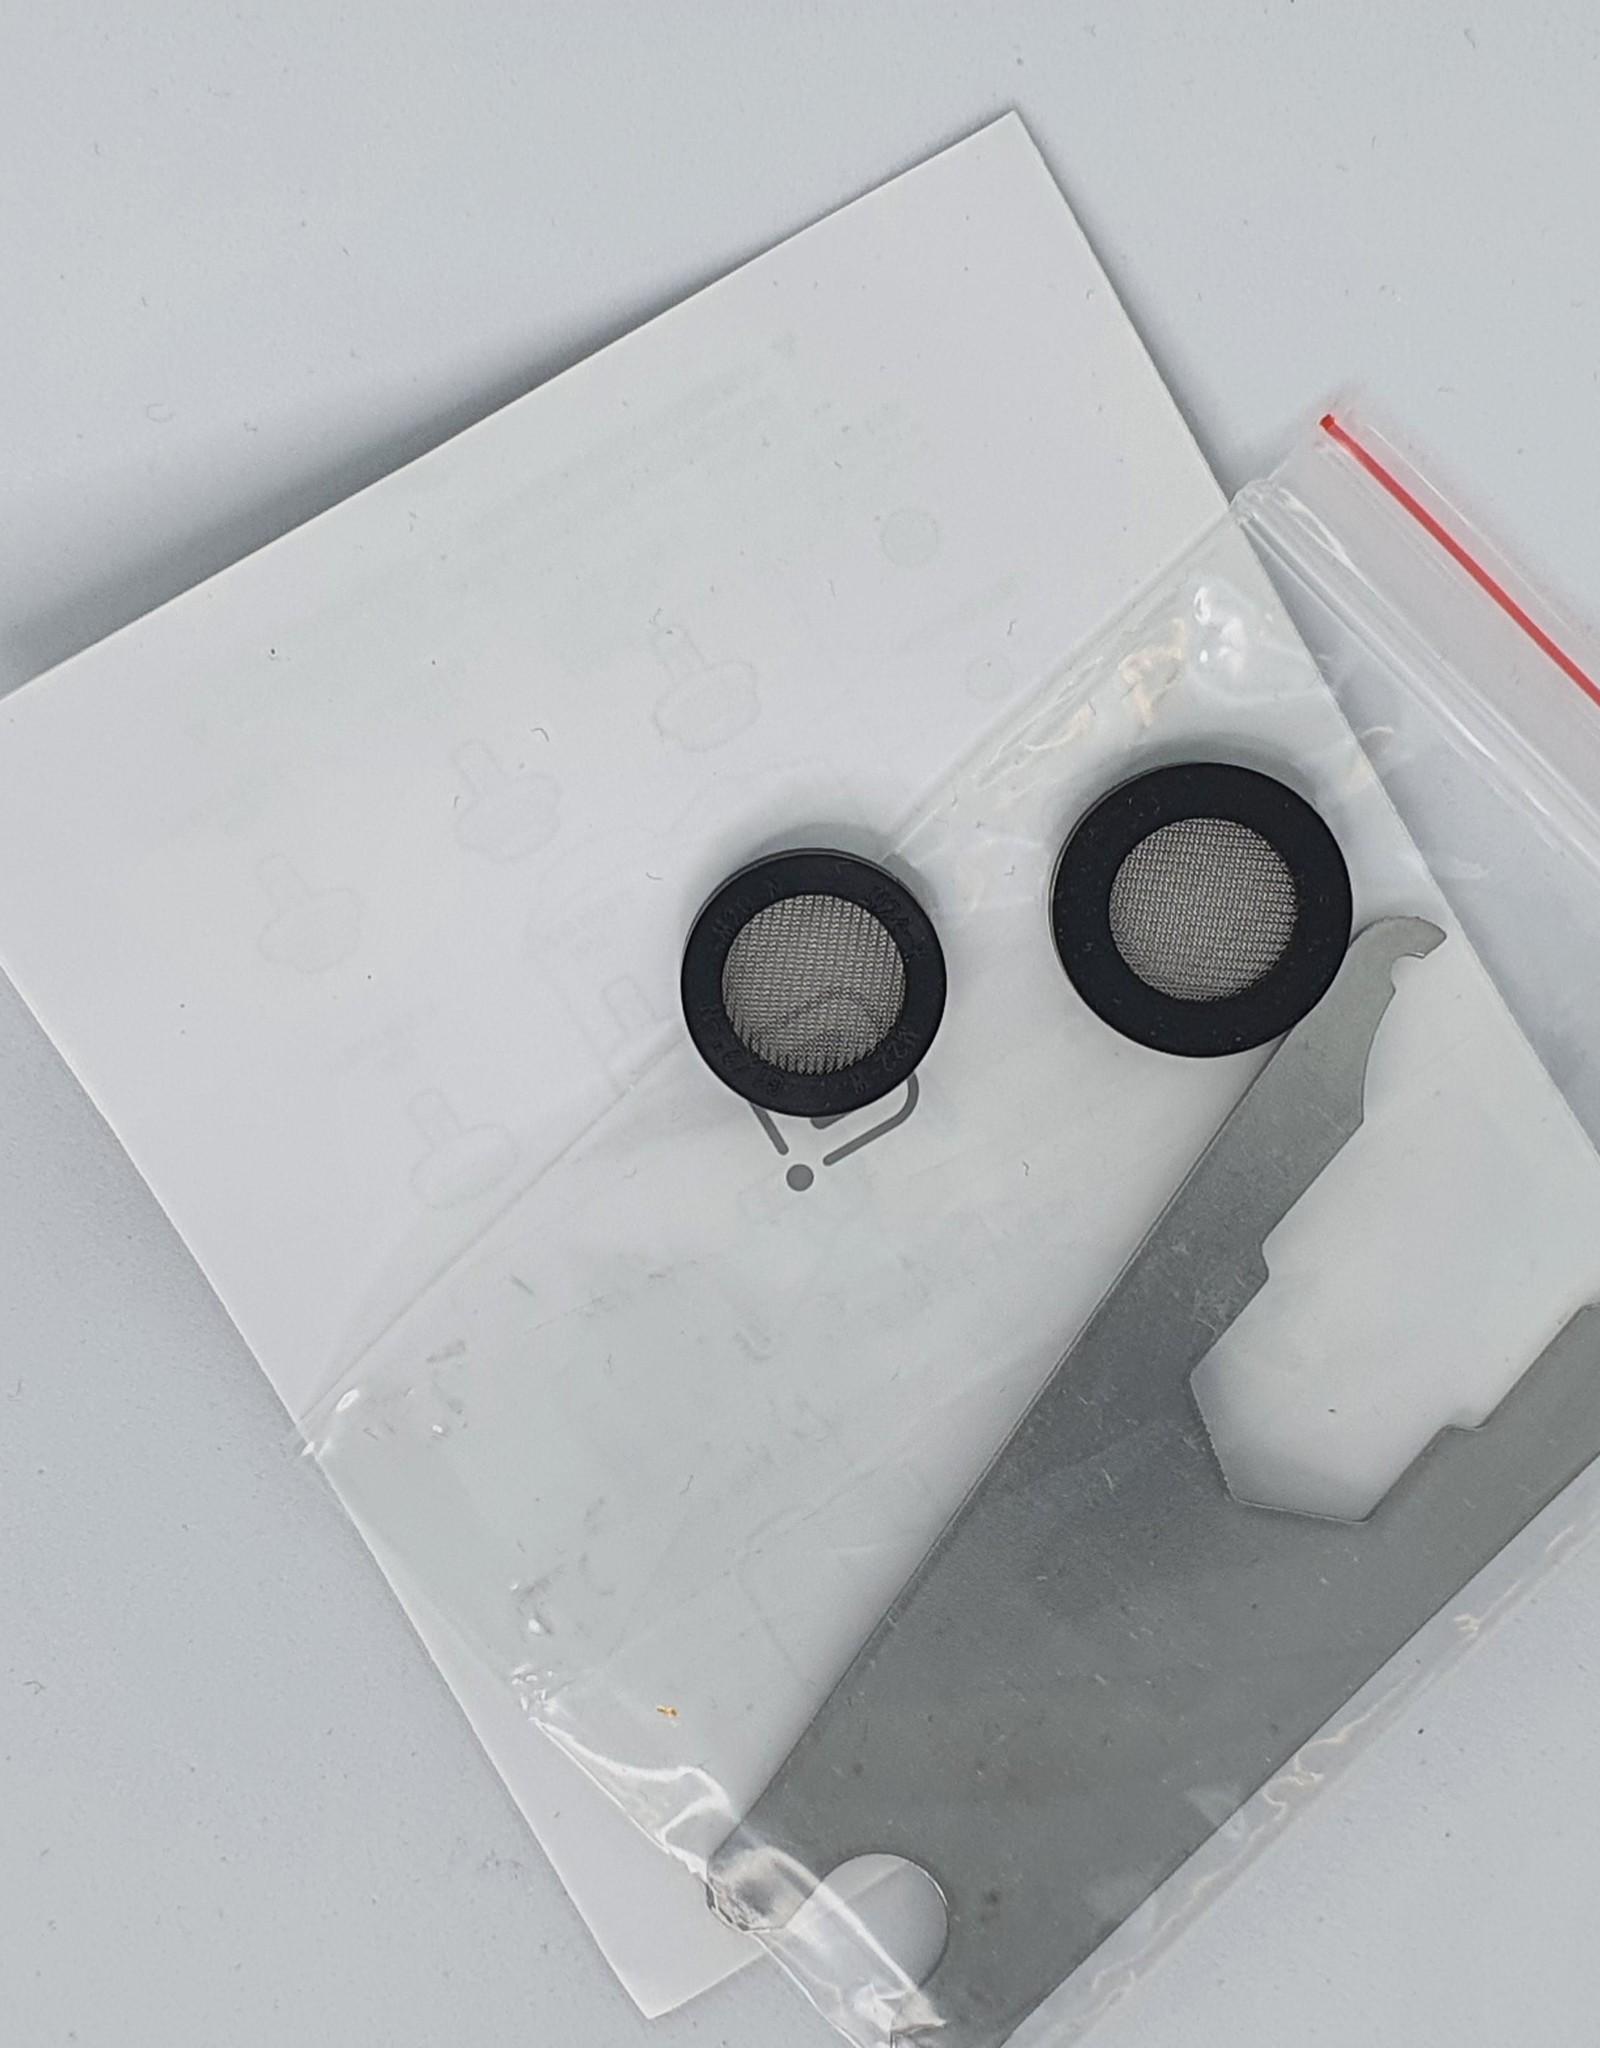 Kraan sensor